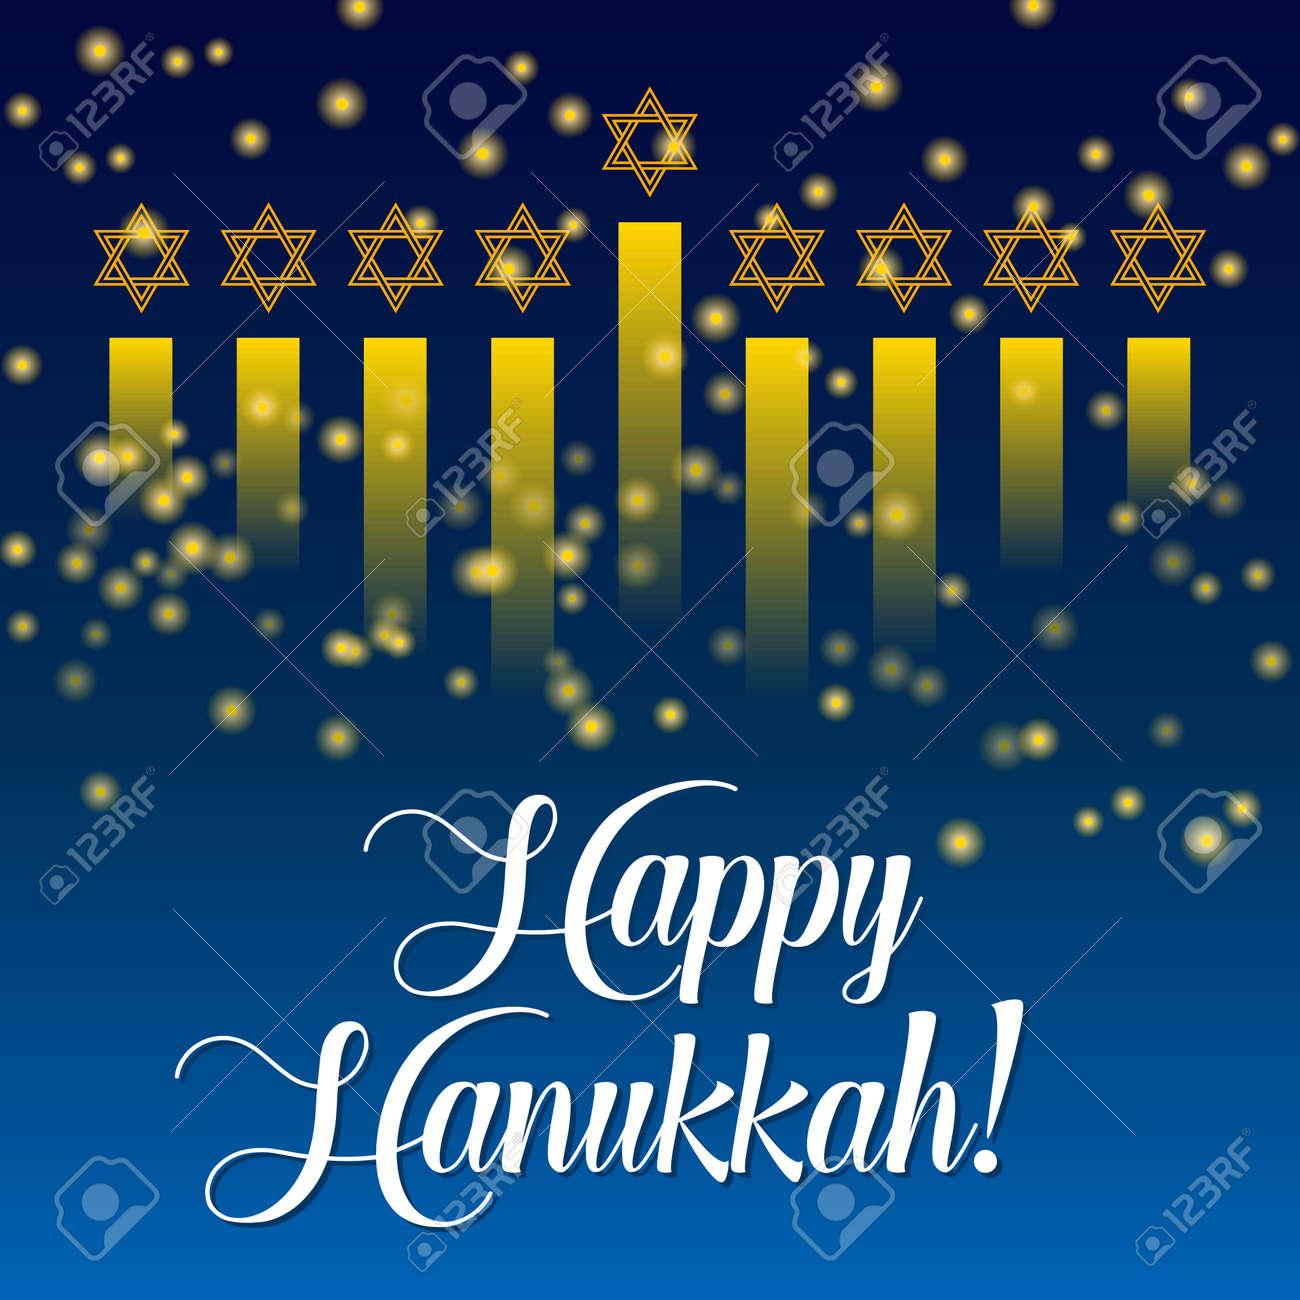 Happy hanukkah greeting card lights on dark background hanukkah happy hanukkah greeting card lights on dark background hanukkah party poster template or banner m4hsunfo